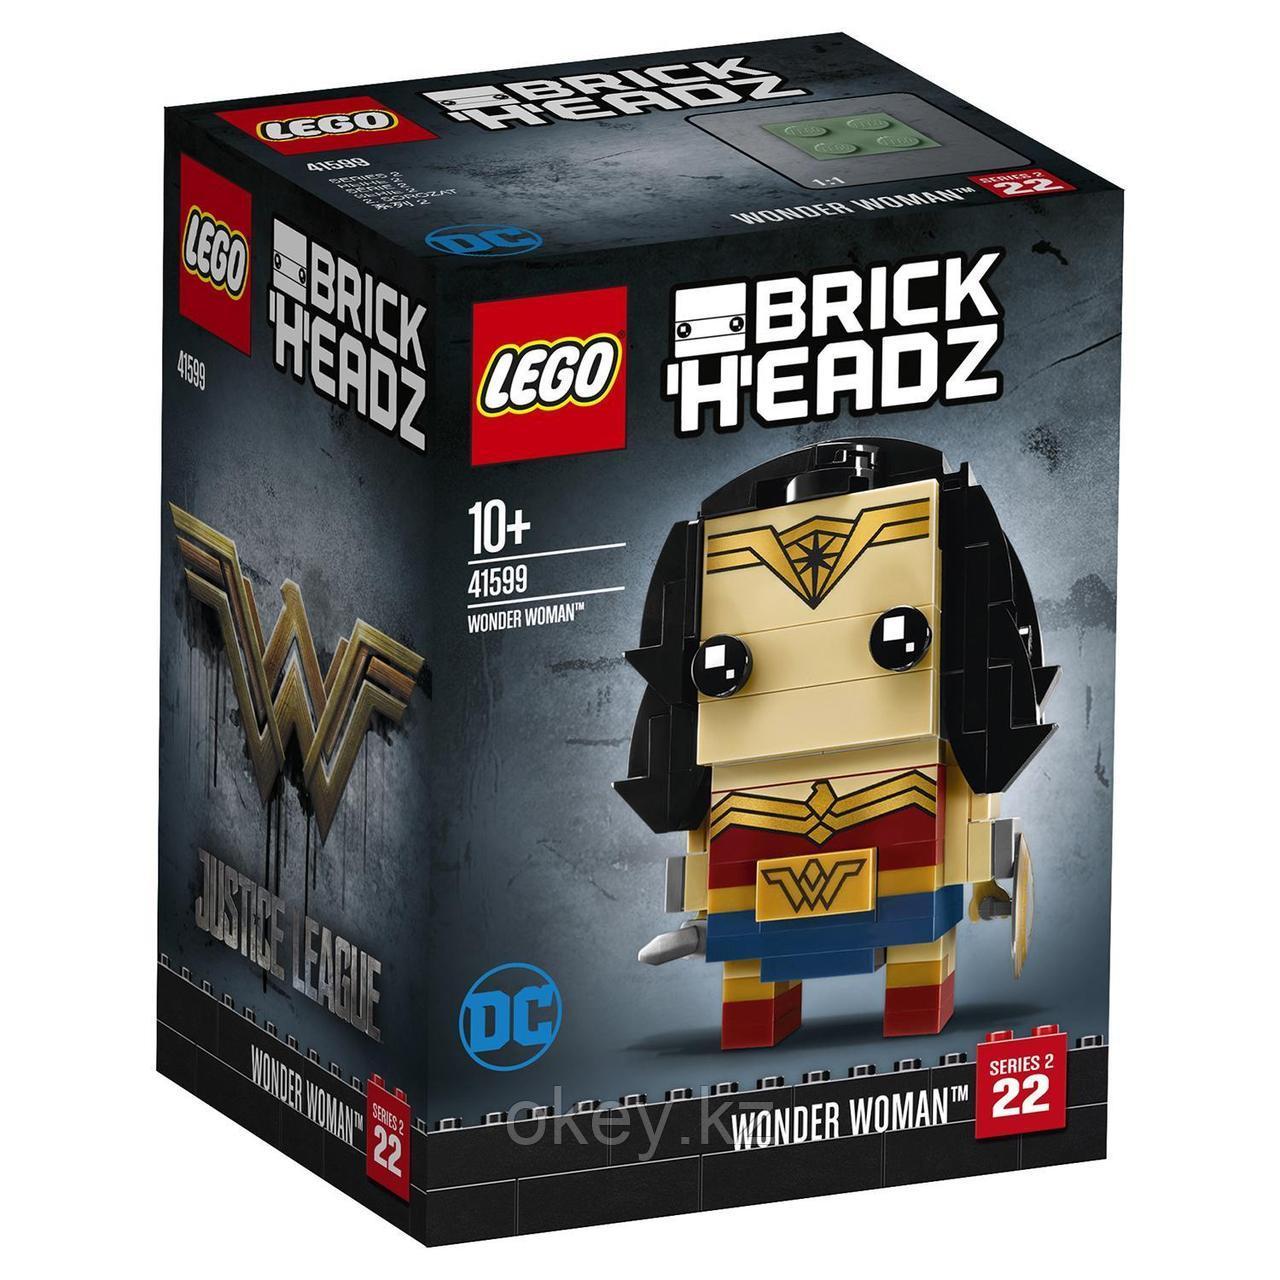 LEGO BrickHeadz: Чудо-женщина 41599